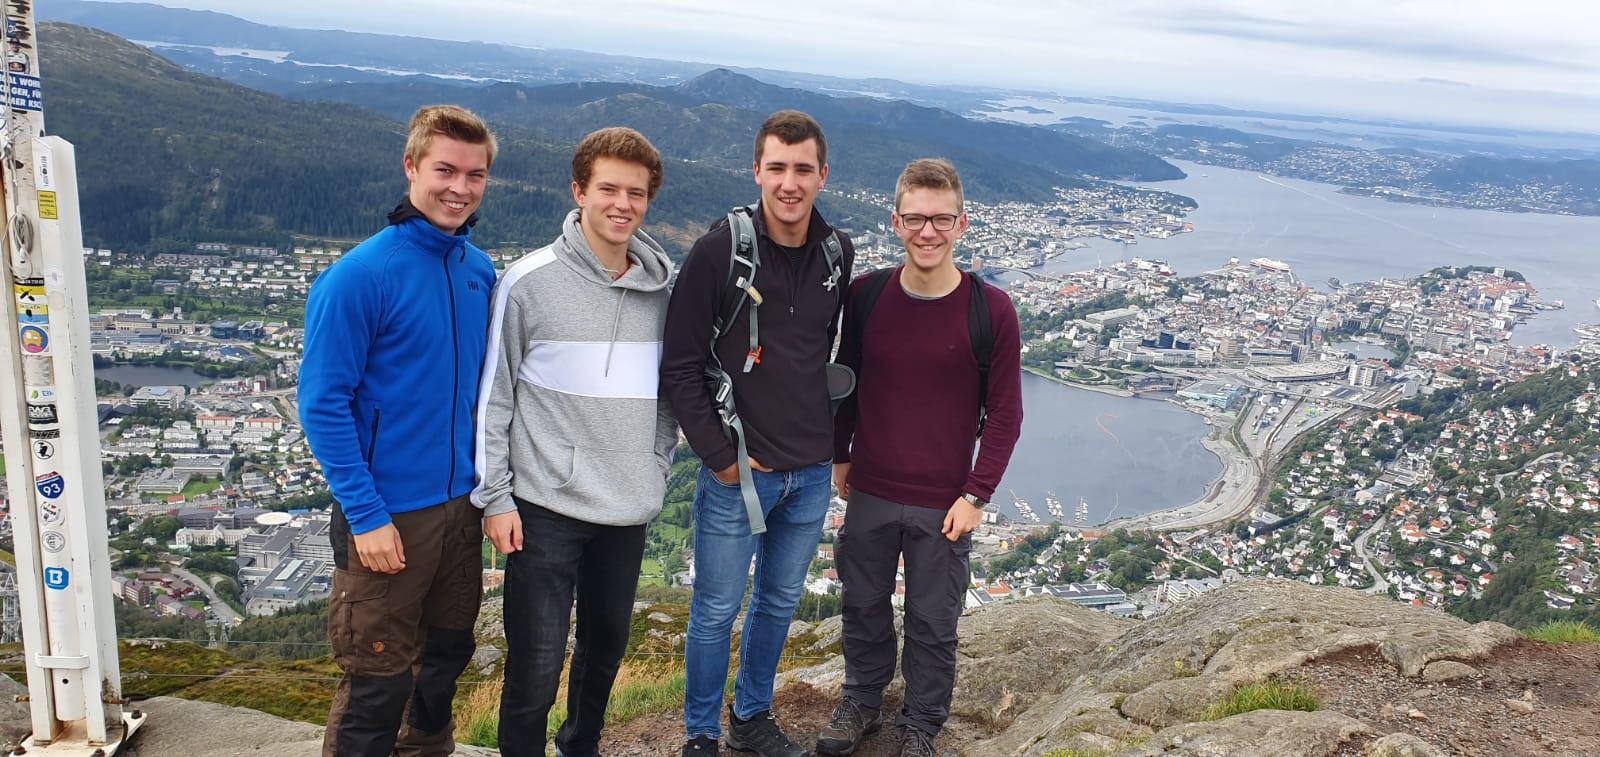 Der Blick vom Ulriken - (v.l.) Hannes, Lasse, Philipp, Thomas